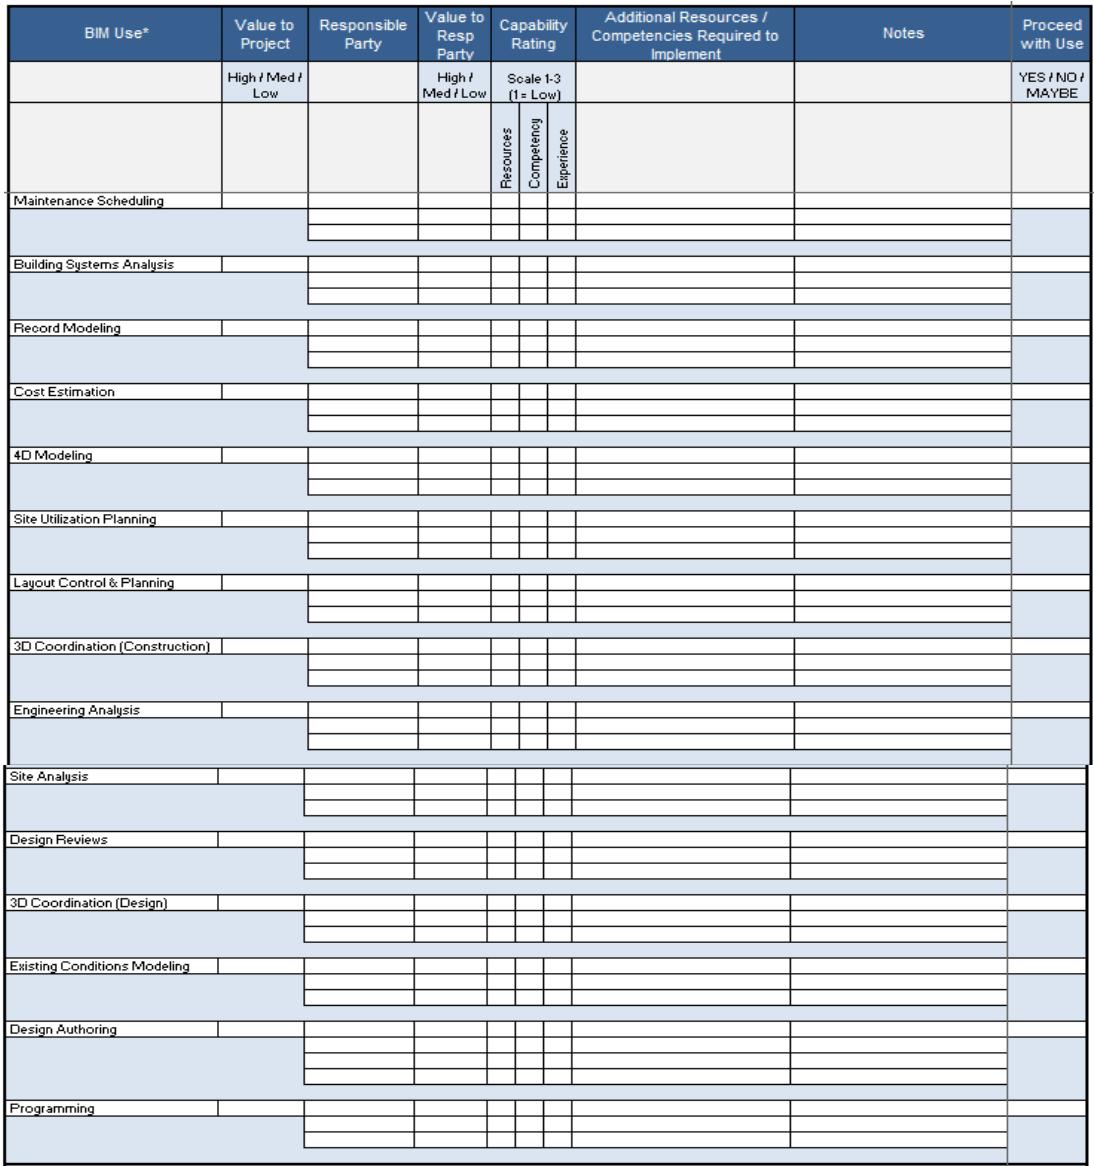 Appendix C Model Useysis Worksheet Bim Project